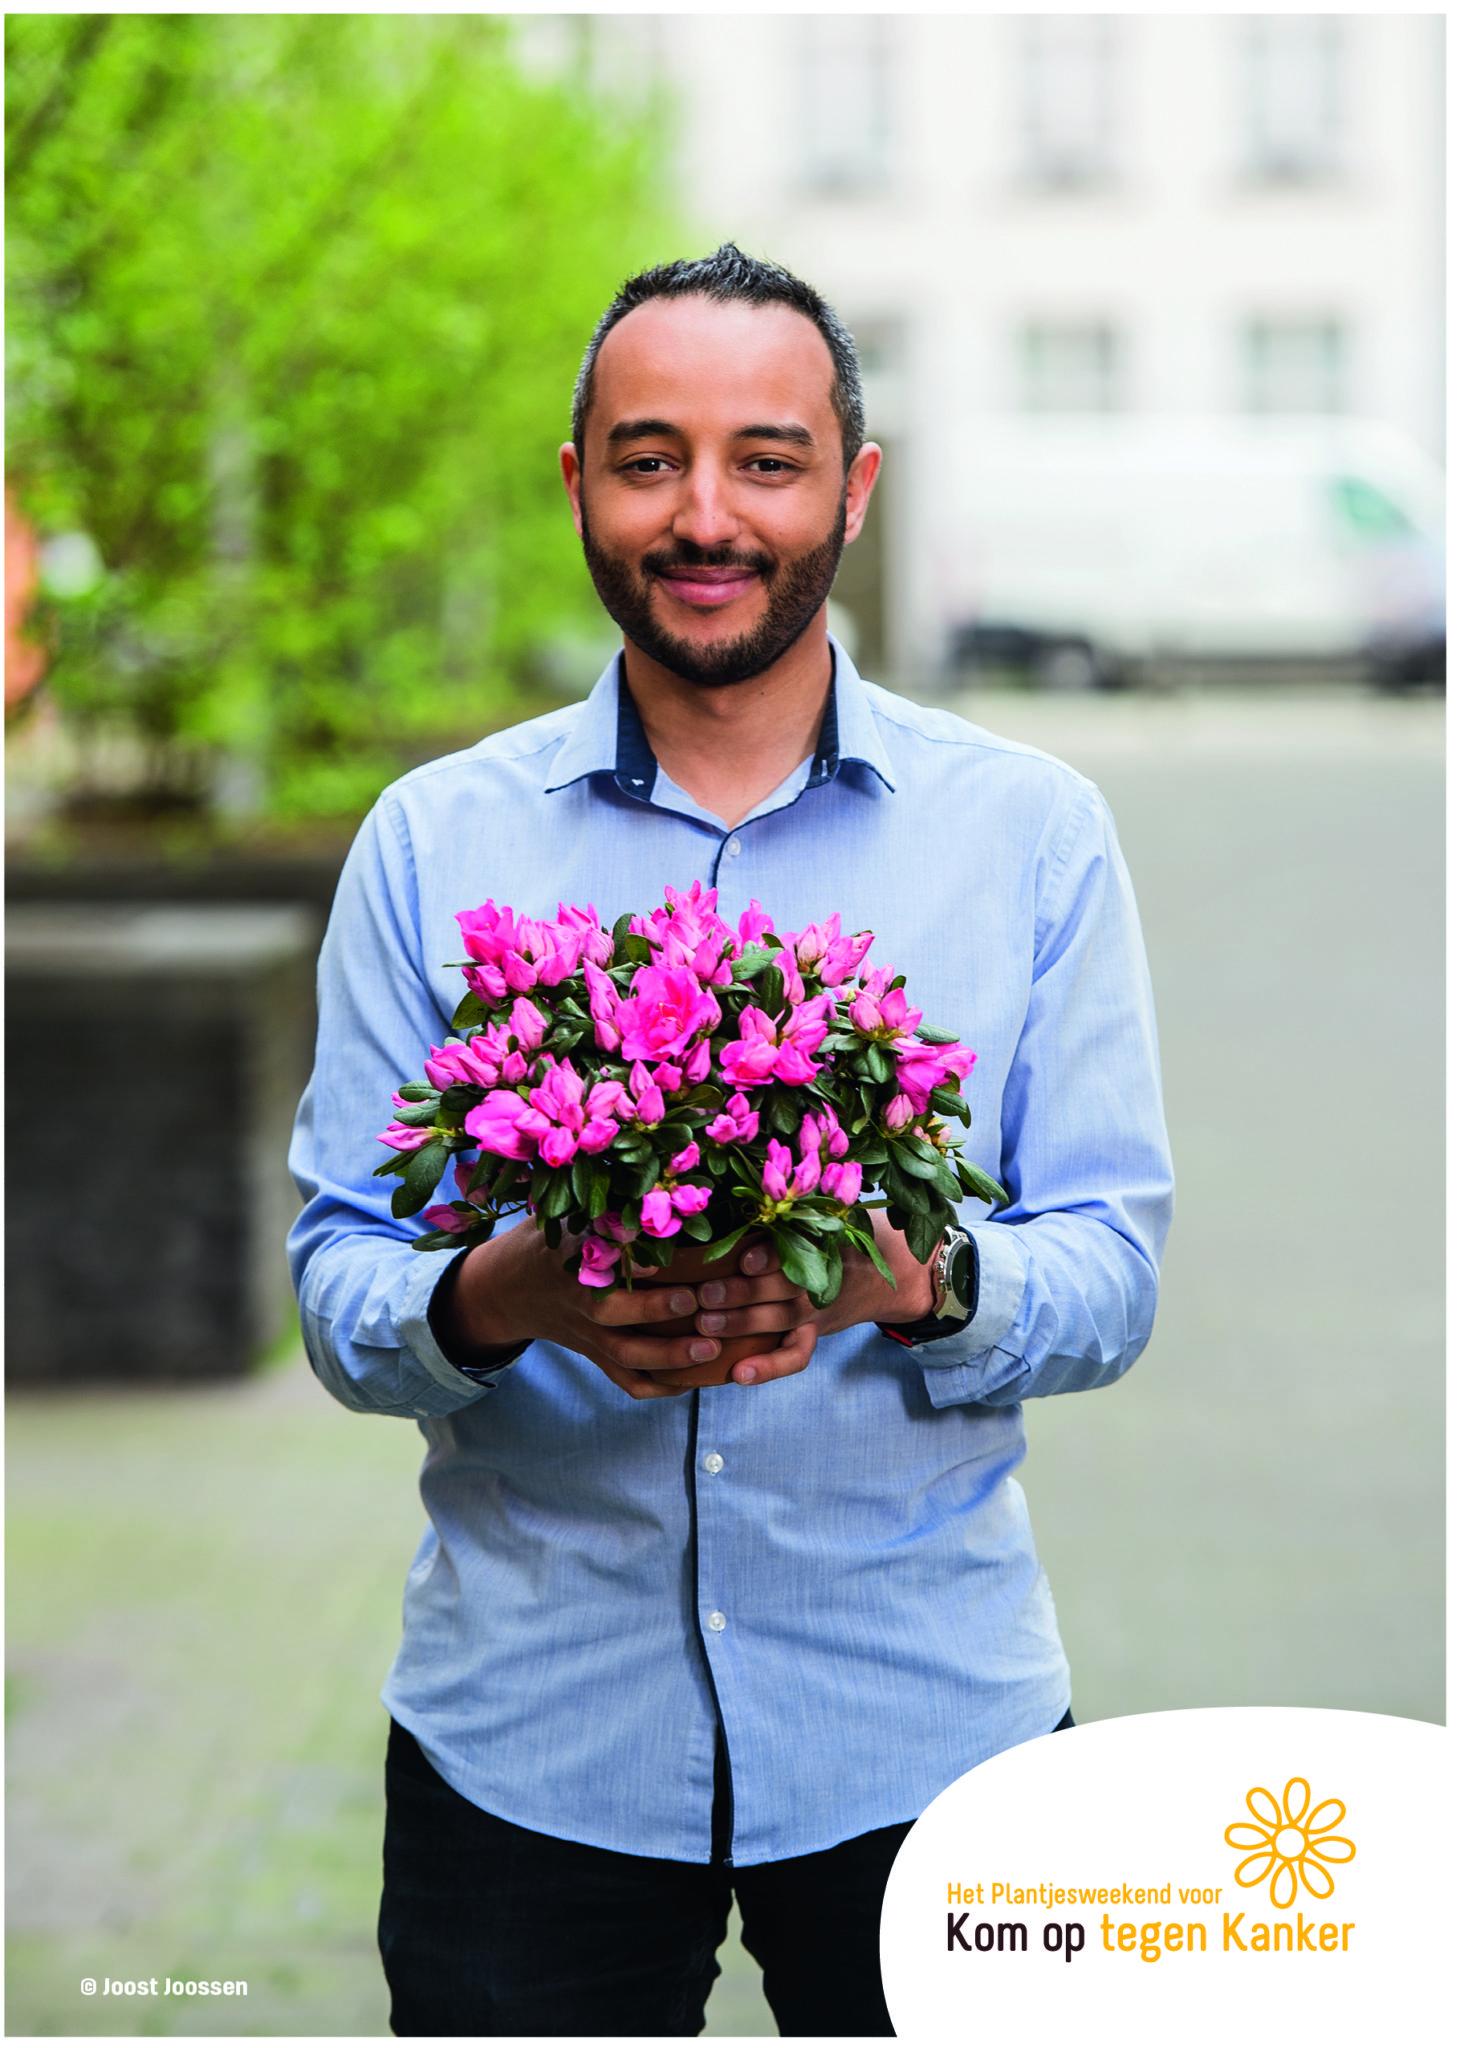 Campagnebeeld Plantjesweekend Kom Op Tegen Kanker 2019